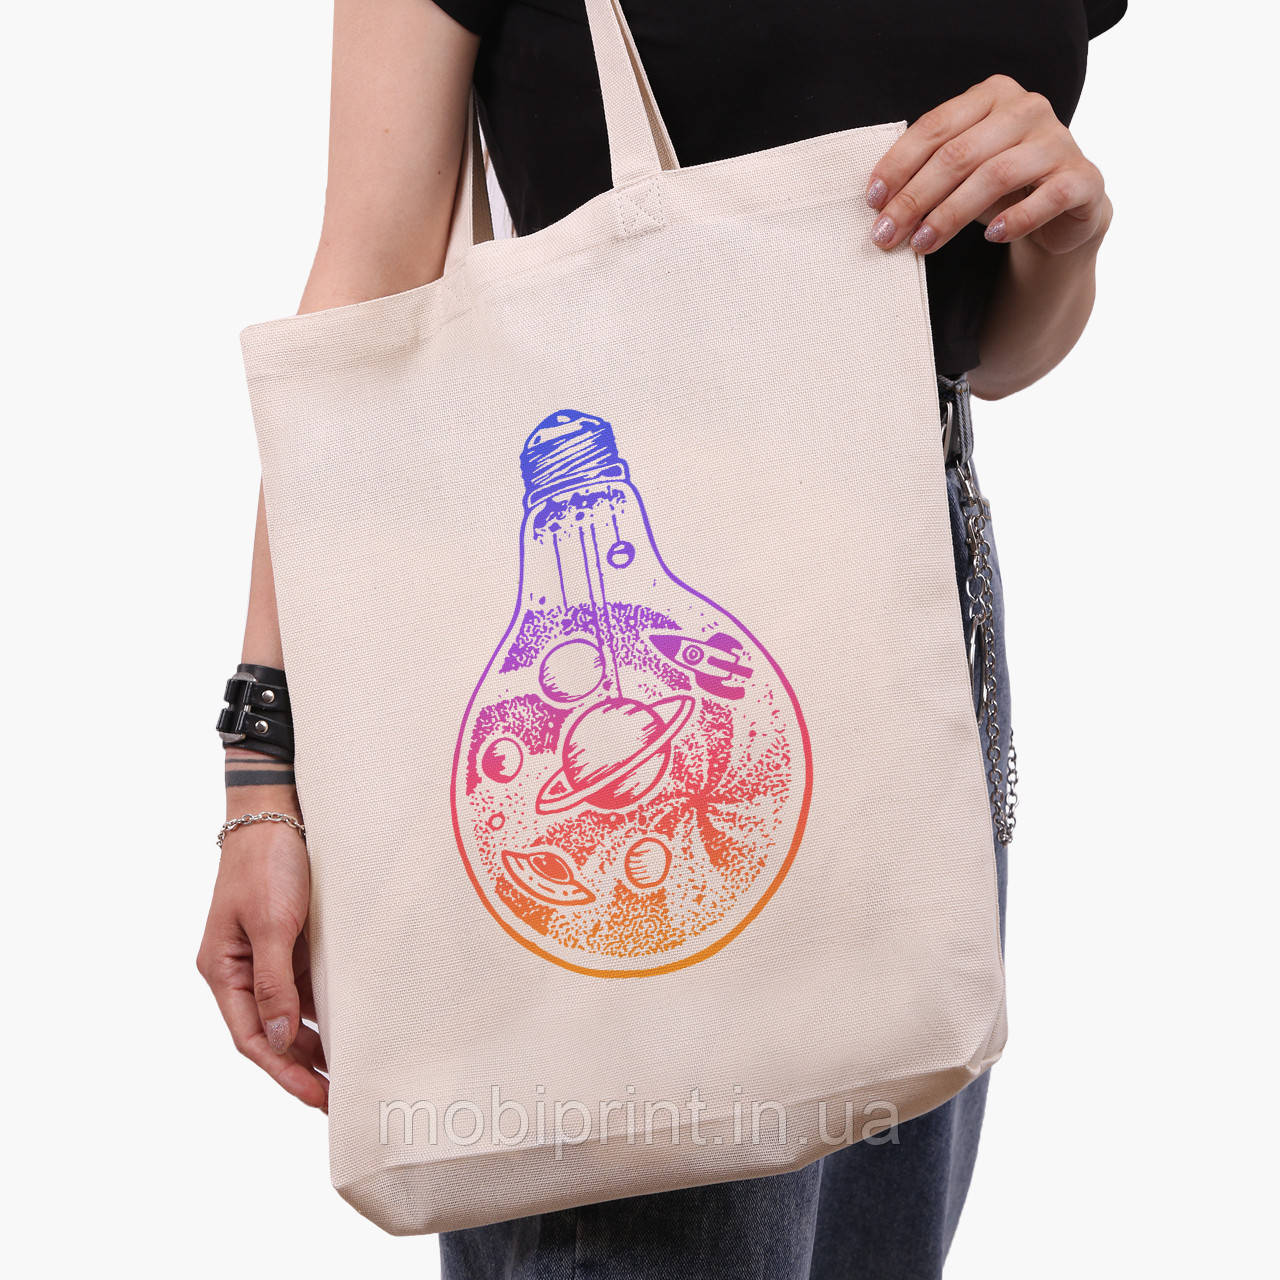 Еко сумка шоппер біла Планети в лампочці (Planets in a light bulb) (9227-2839-1) 41*39*8 см